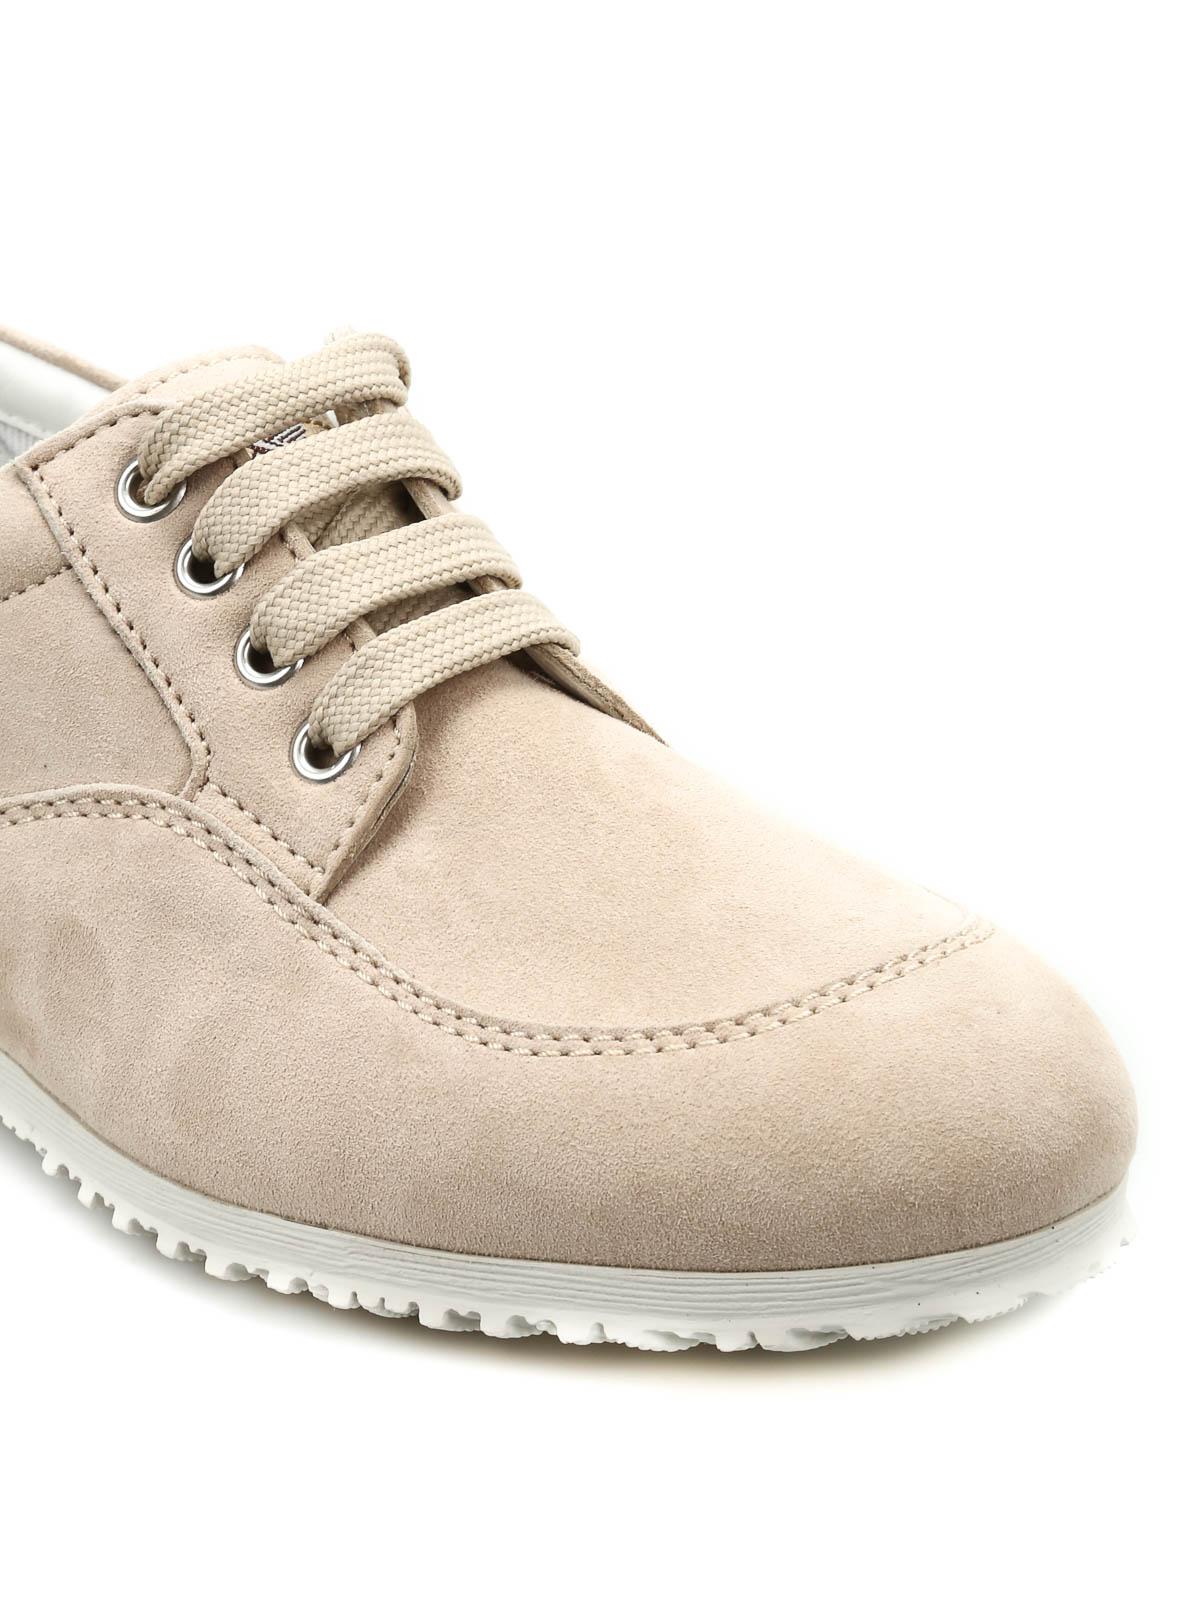 Hogan - Stringate Traditional - sneakers - HXW2580R490CR0M024 ... 1ec6a9e5feb